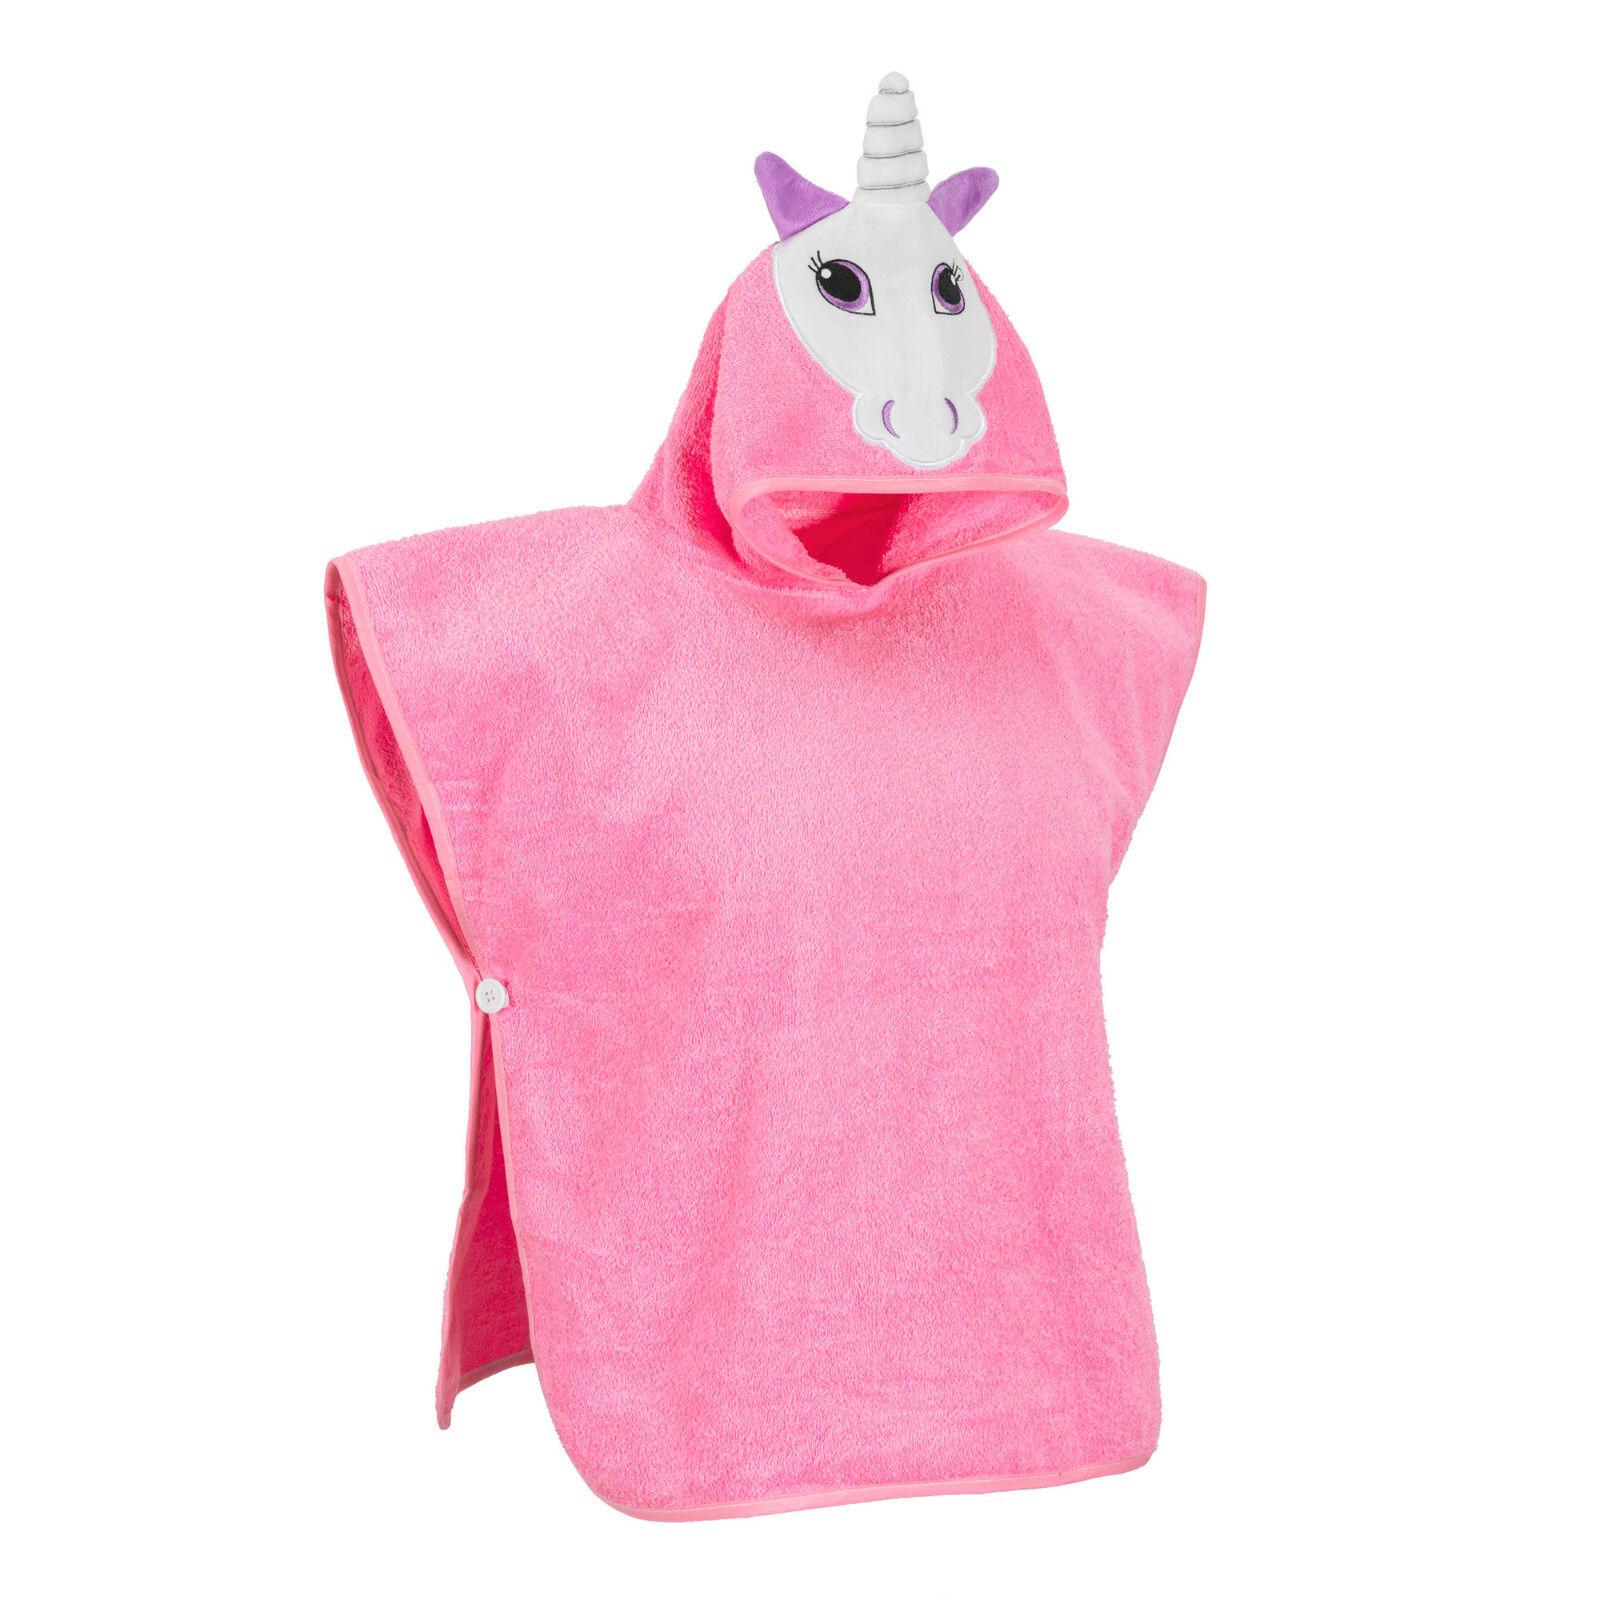 Hudz Kidz Softest Quick Dry Hooded Kids Towel for Toddler -